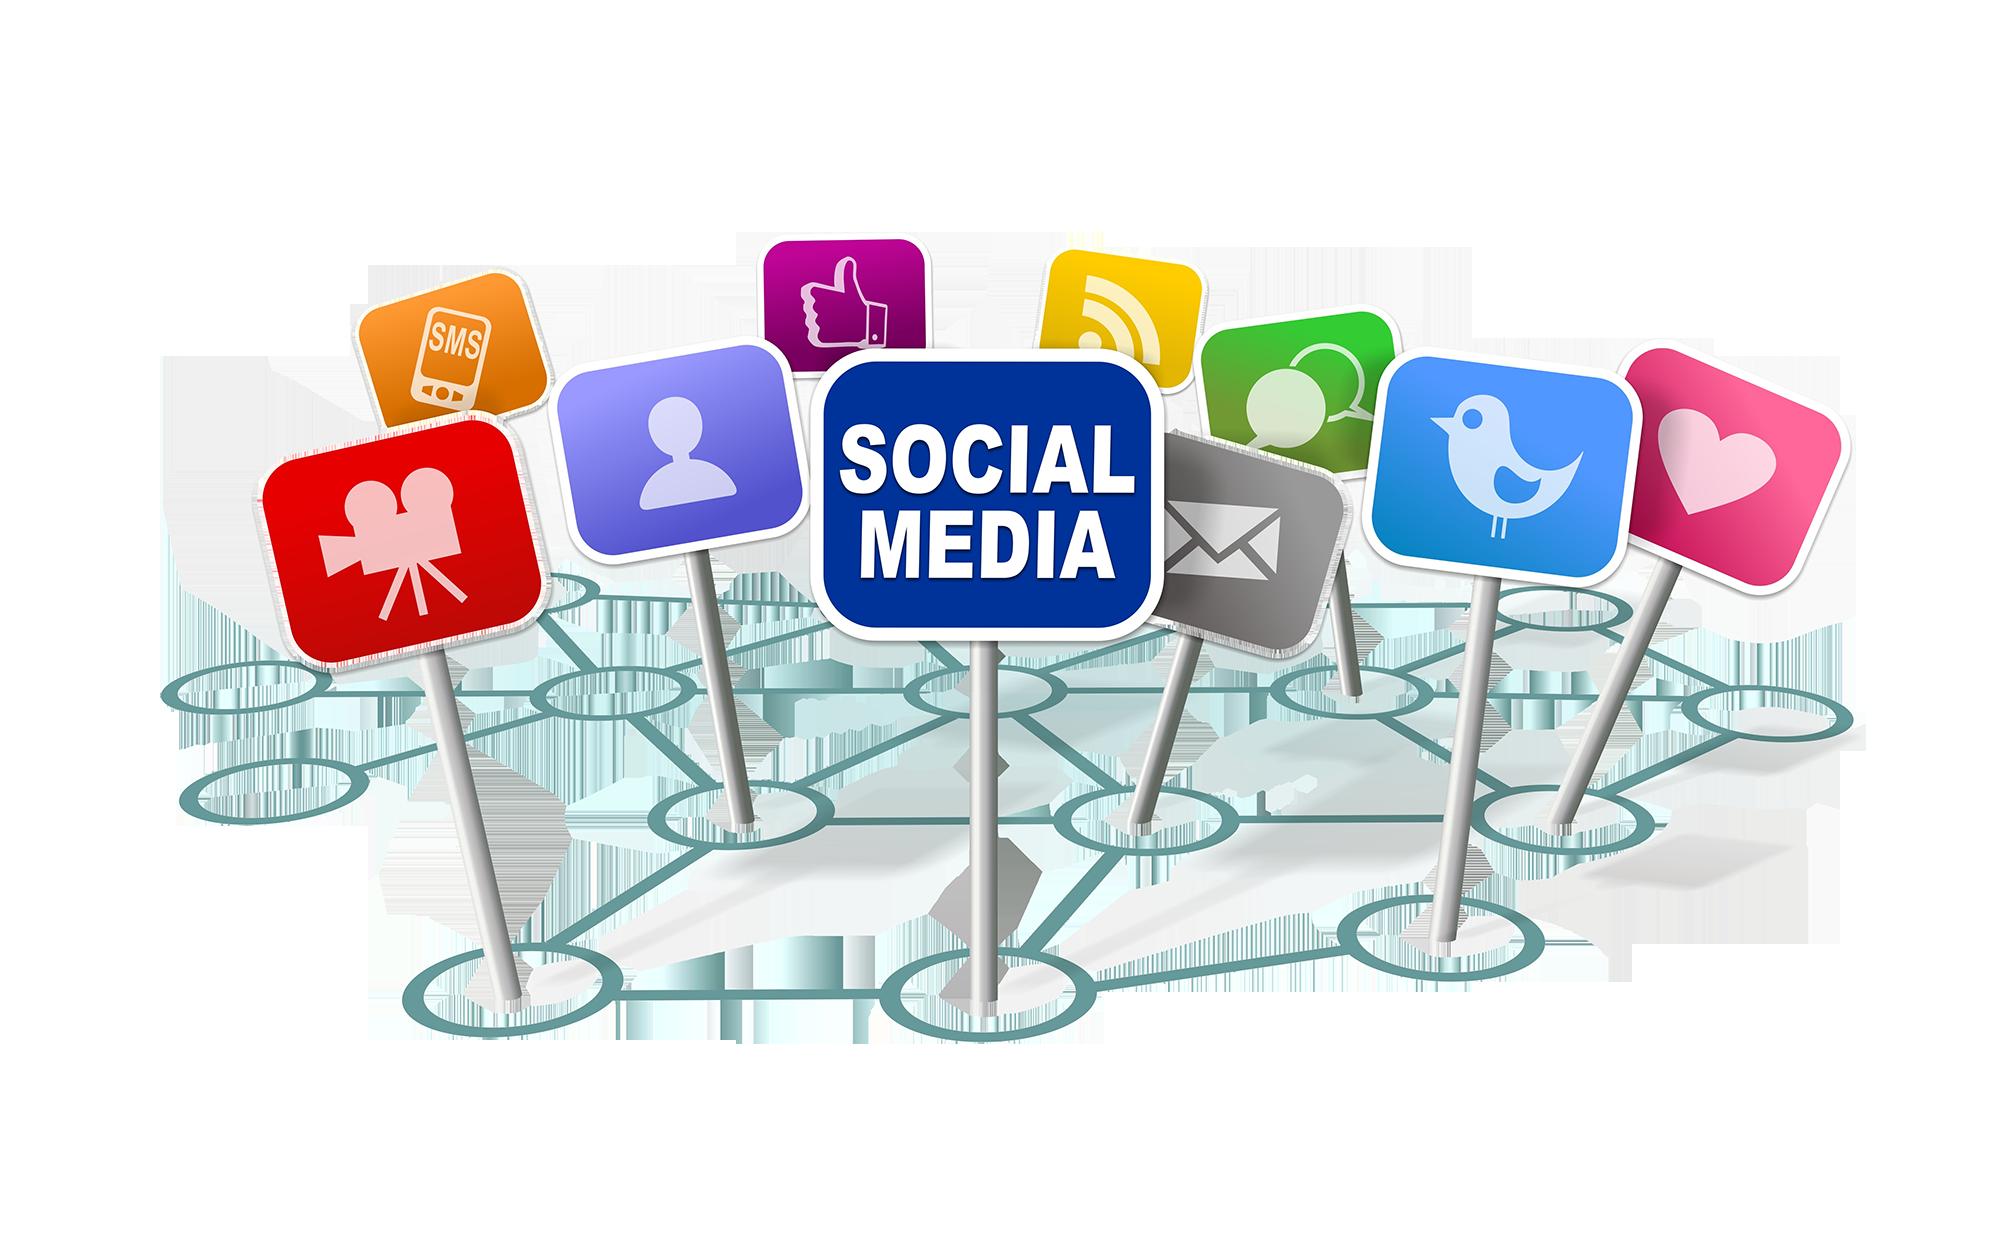 Technology clipart new media, Technology new media.